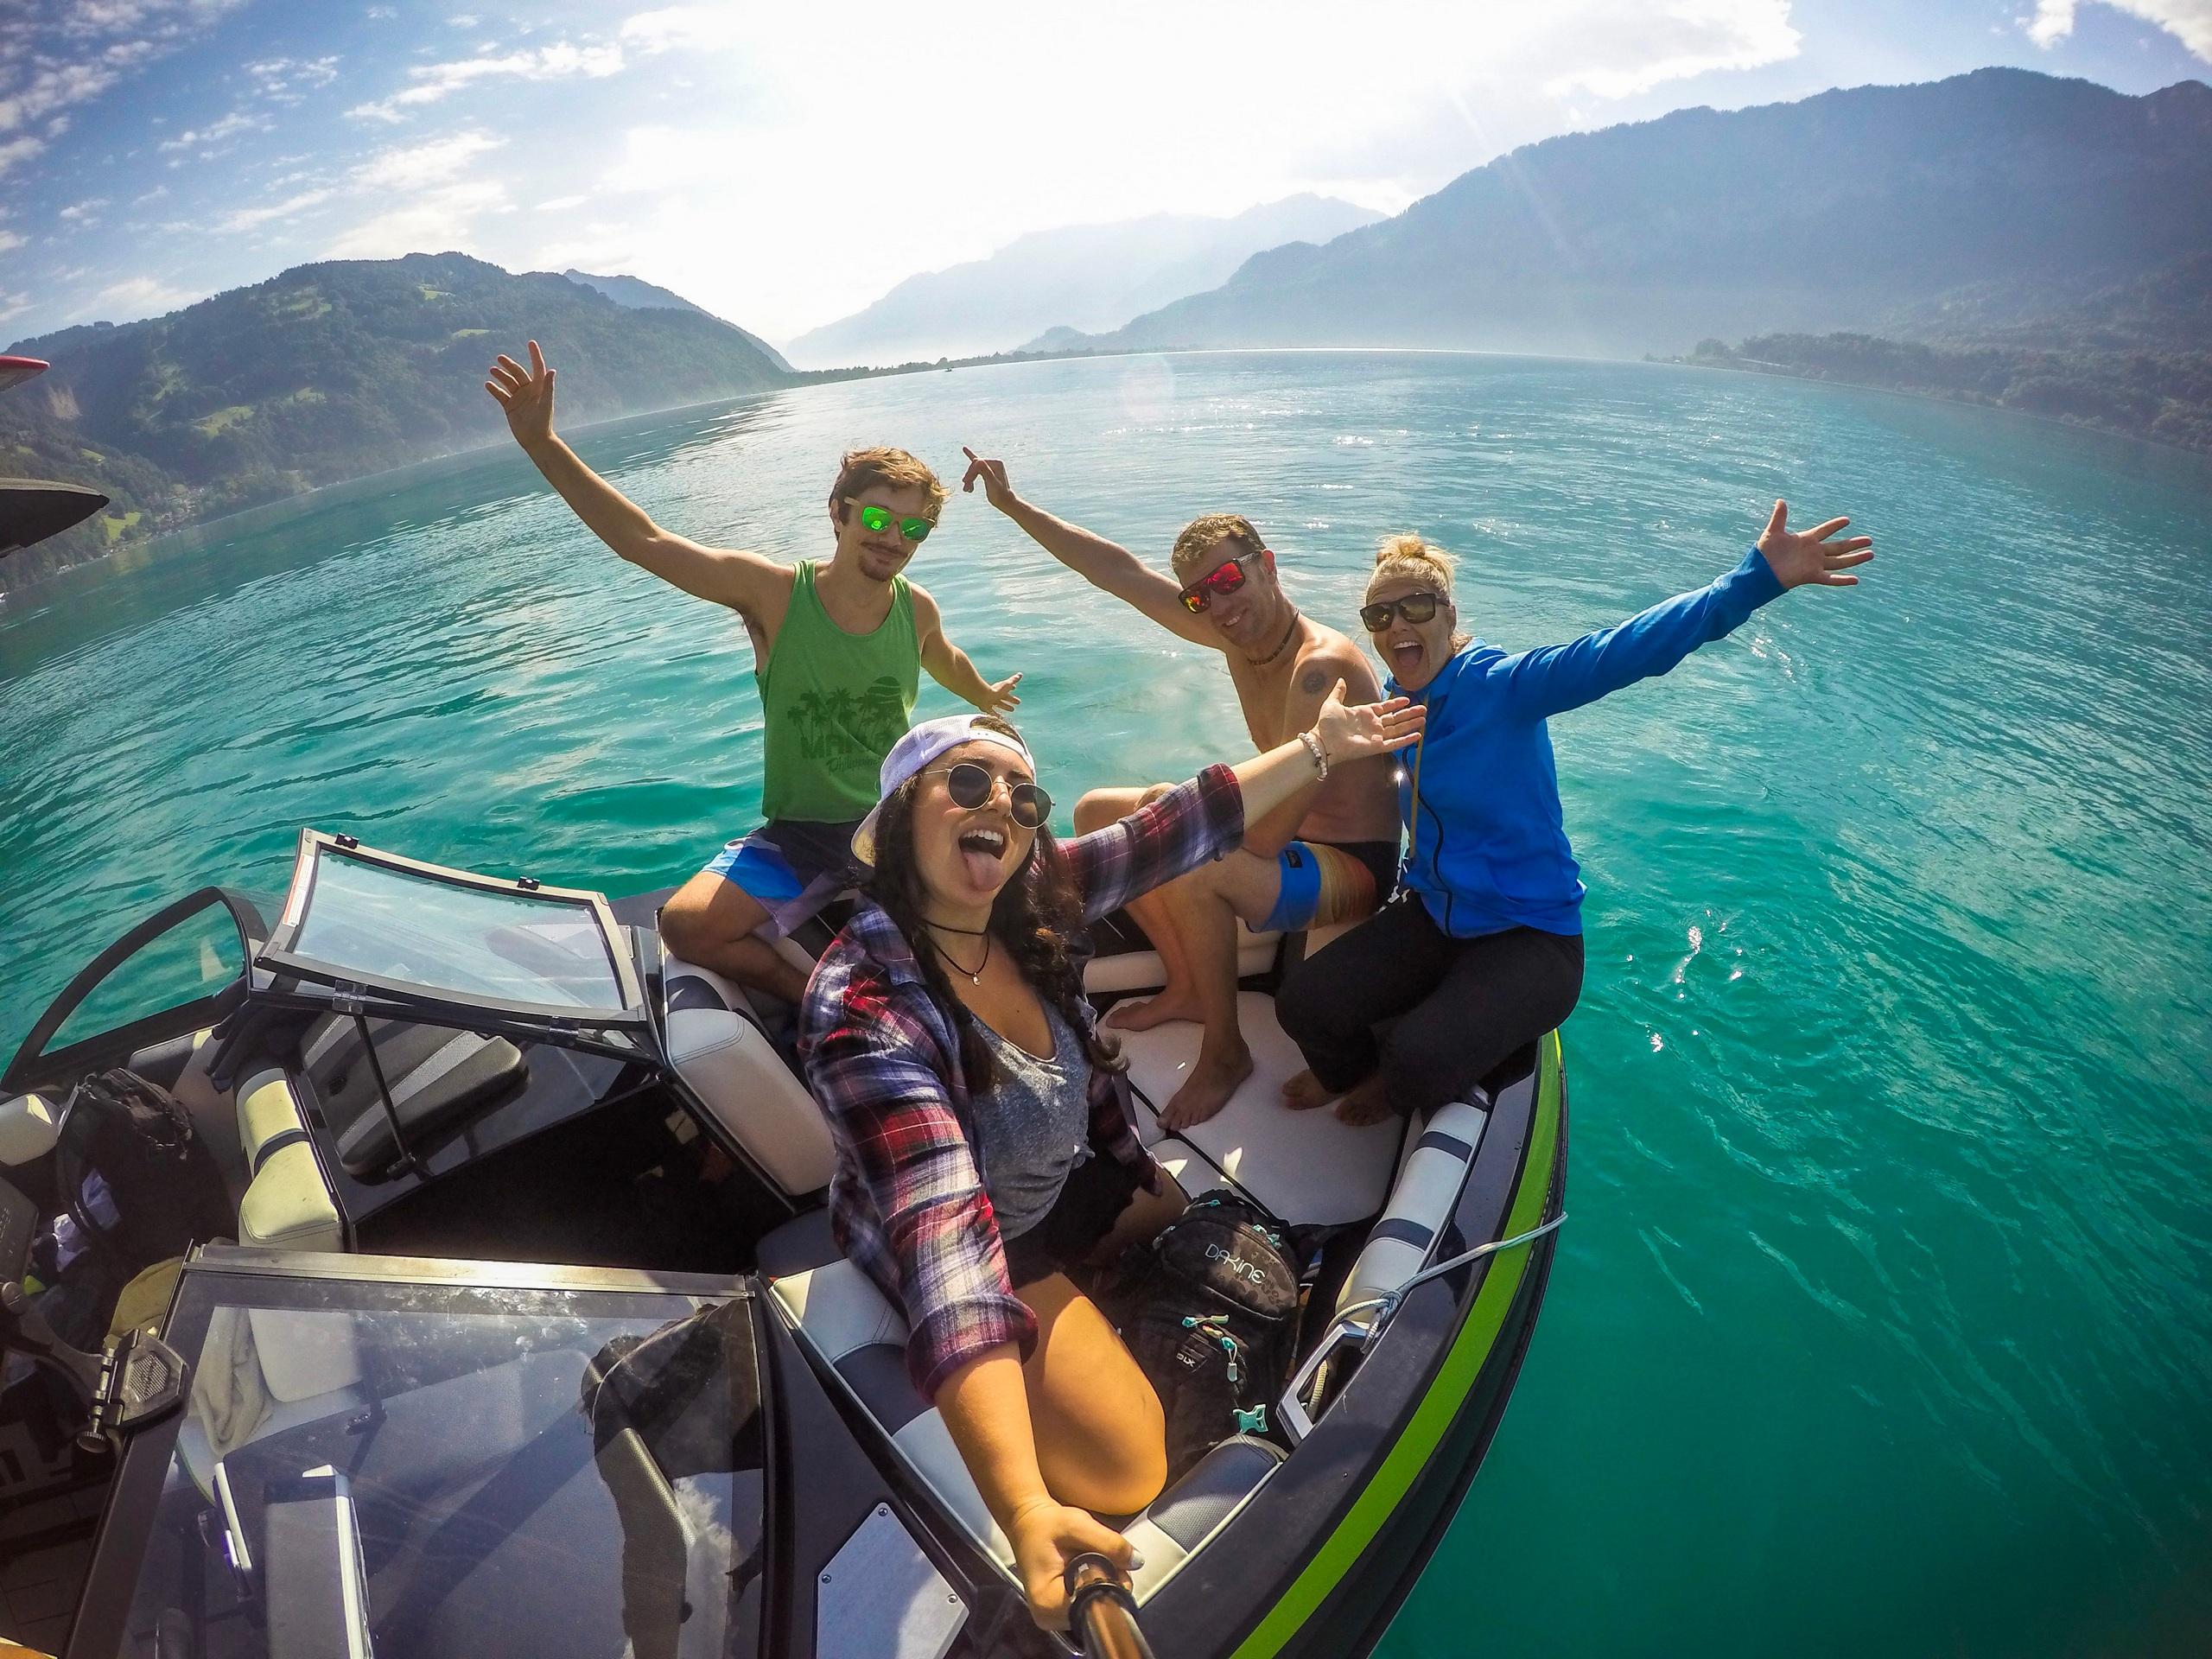 mountainsurf-thunersee-wassersport-motoboot-sommer-wakeboarding